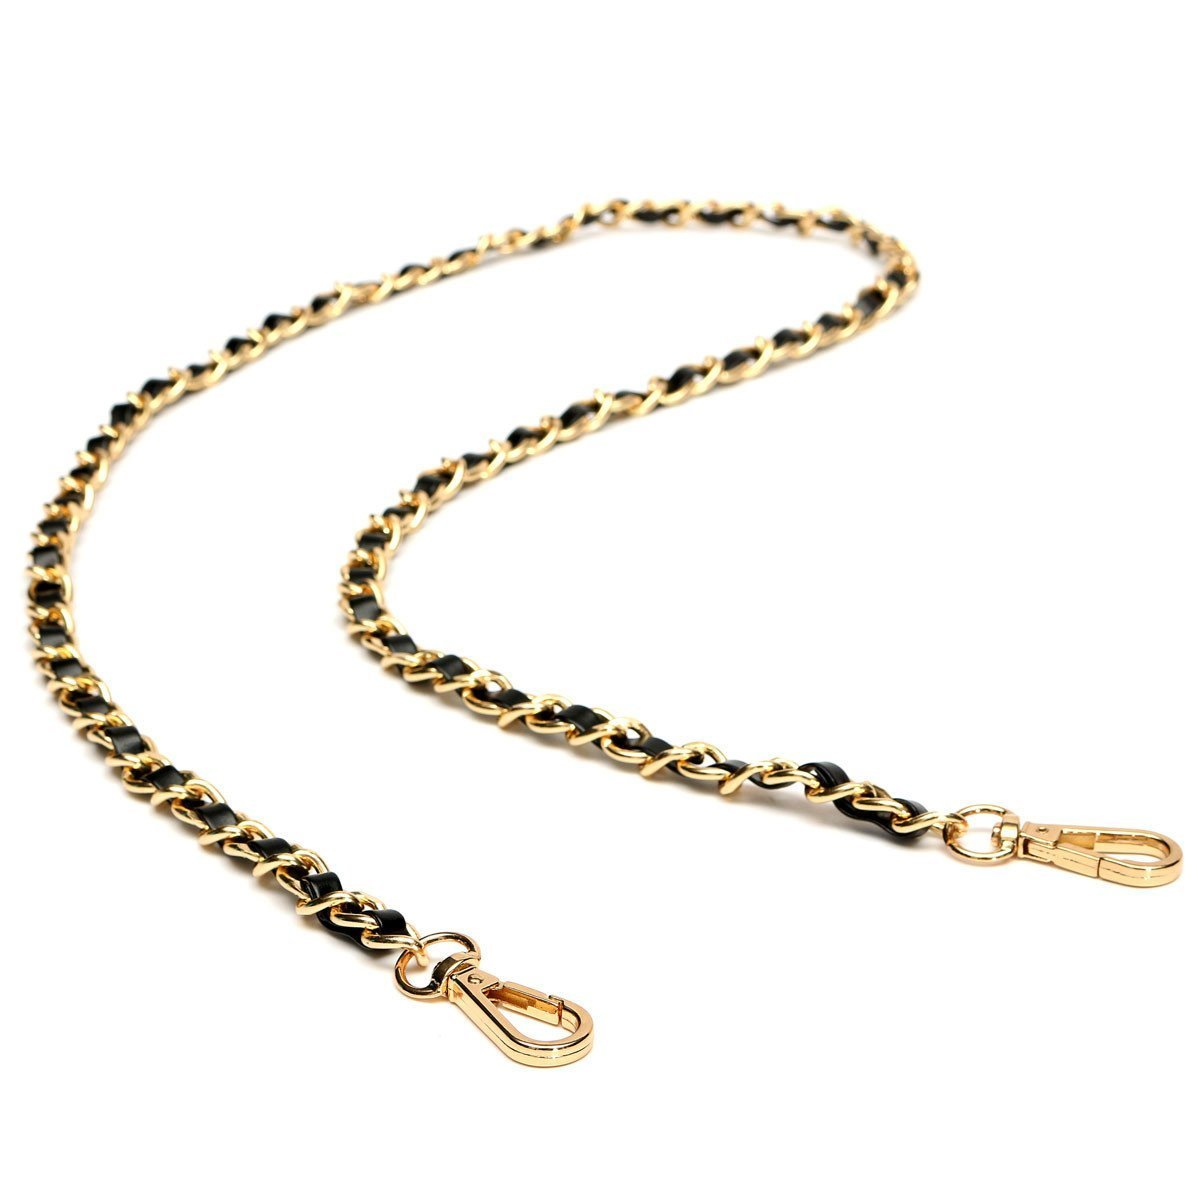 DCOS Chain Purse Cross-body Handbag Shoulder Bag Strap Replacement Accessories Light gold + black120cm